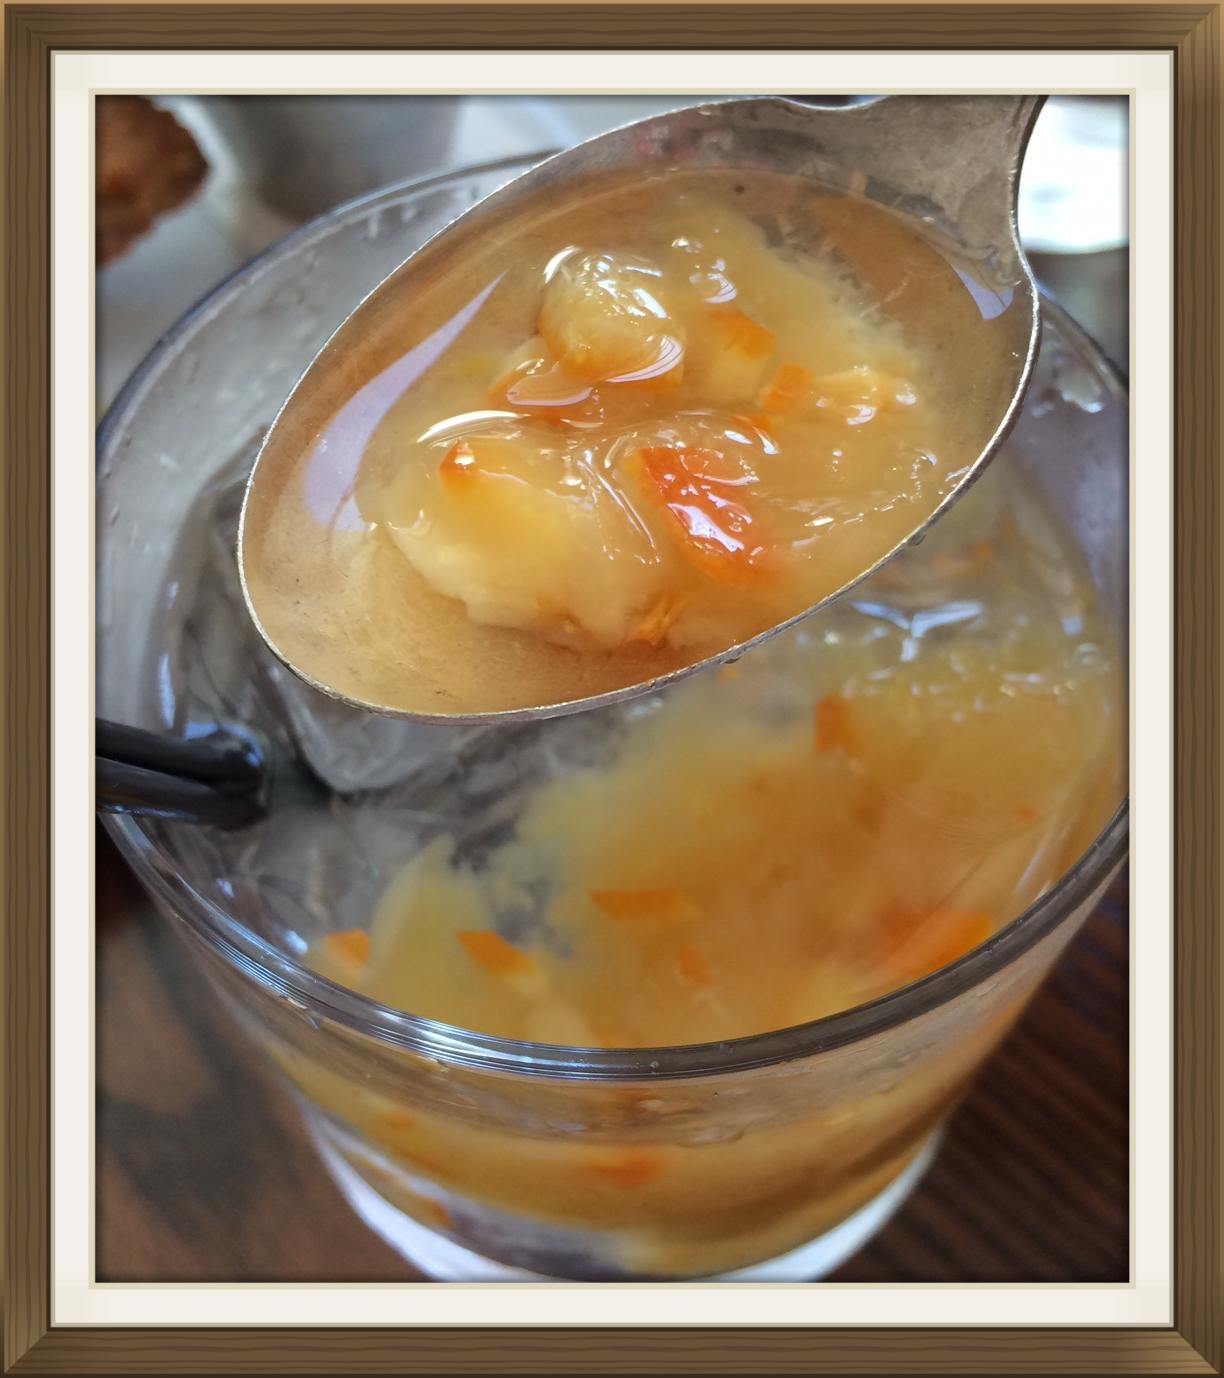 Gin & Jam at Second Bar + Kitchen